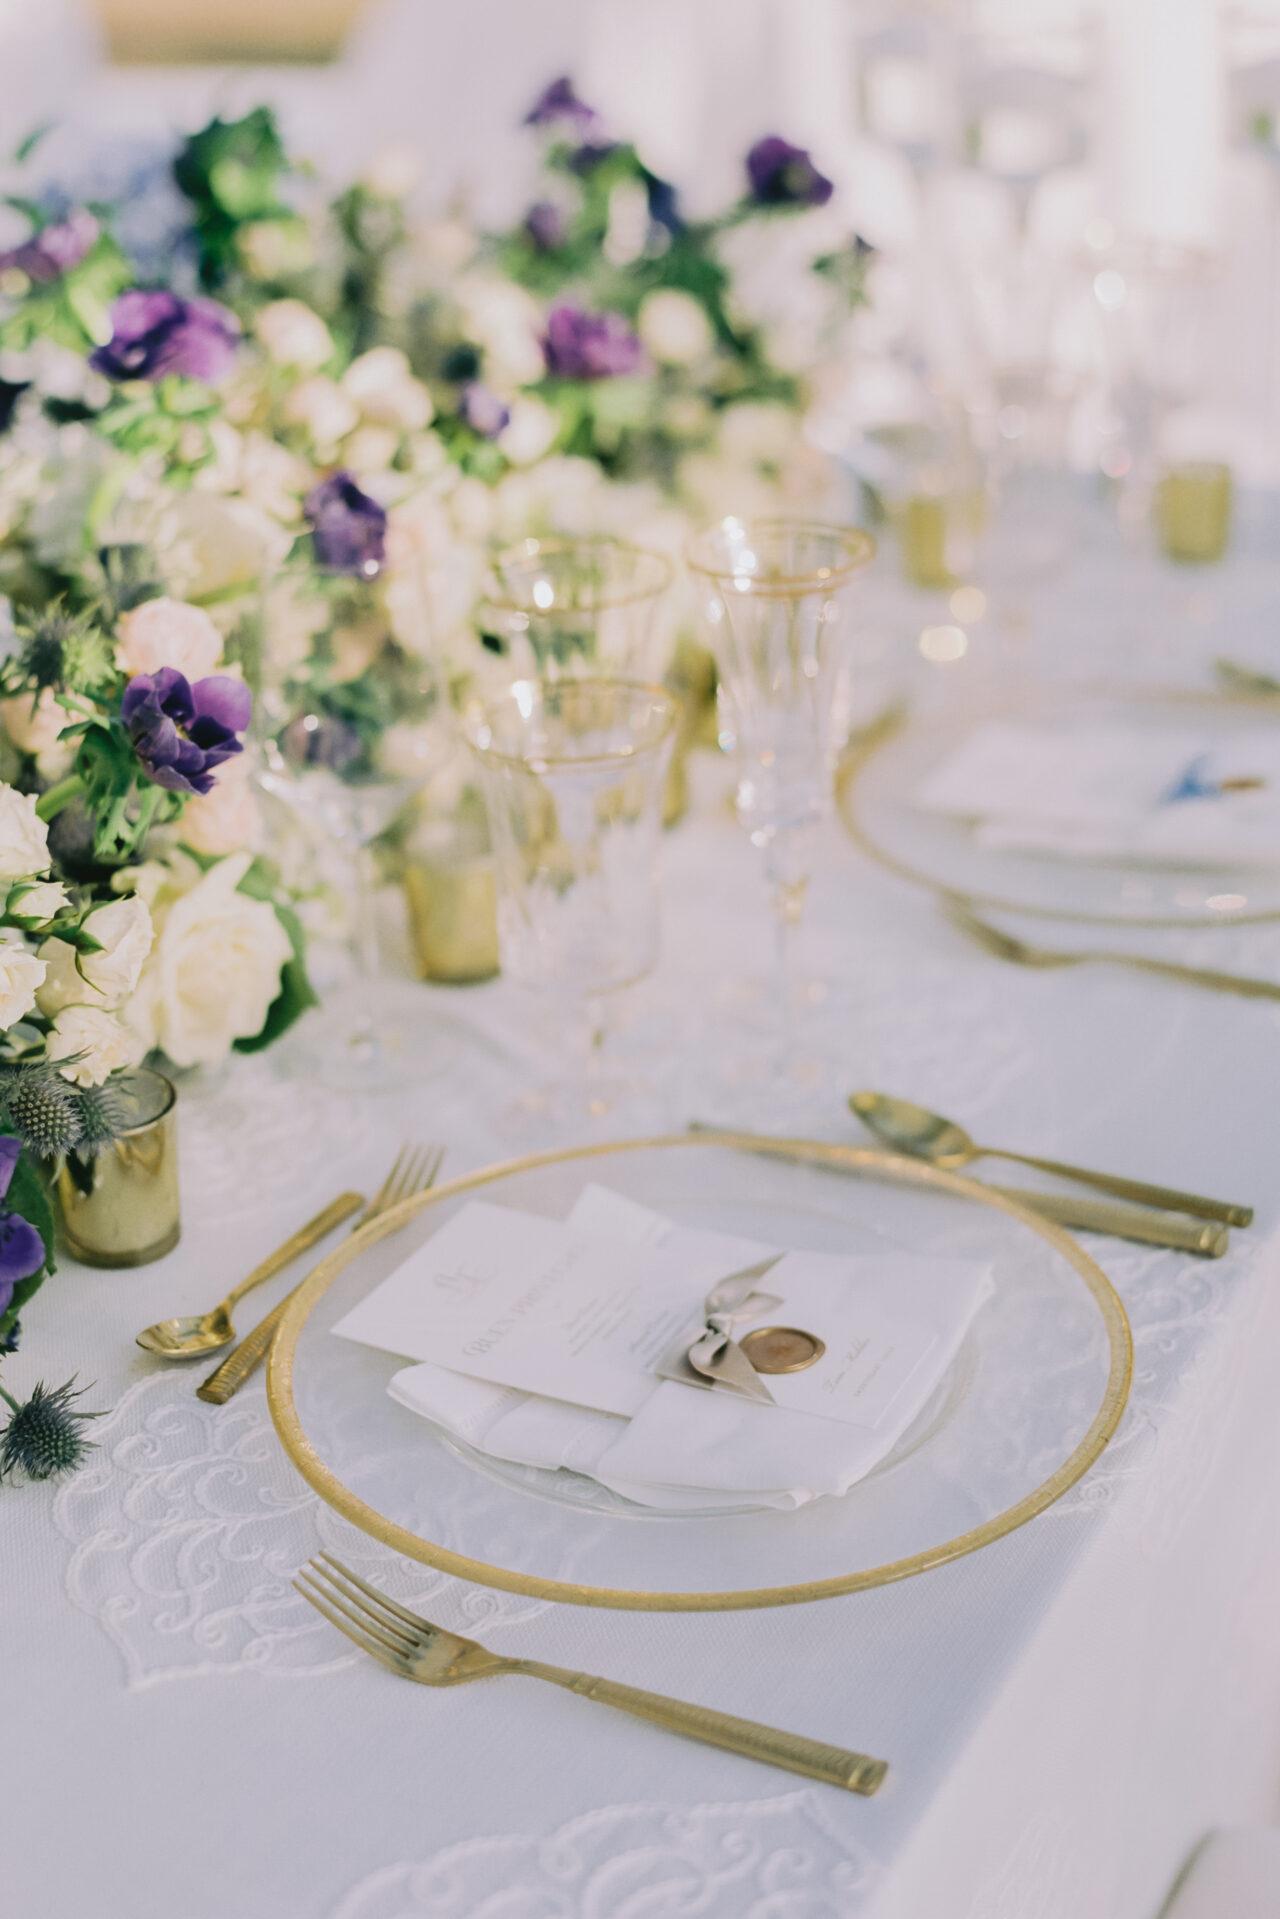 wedding details by joann moore